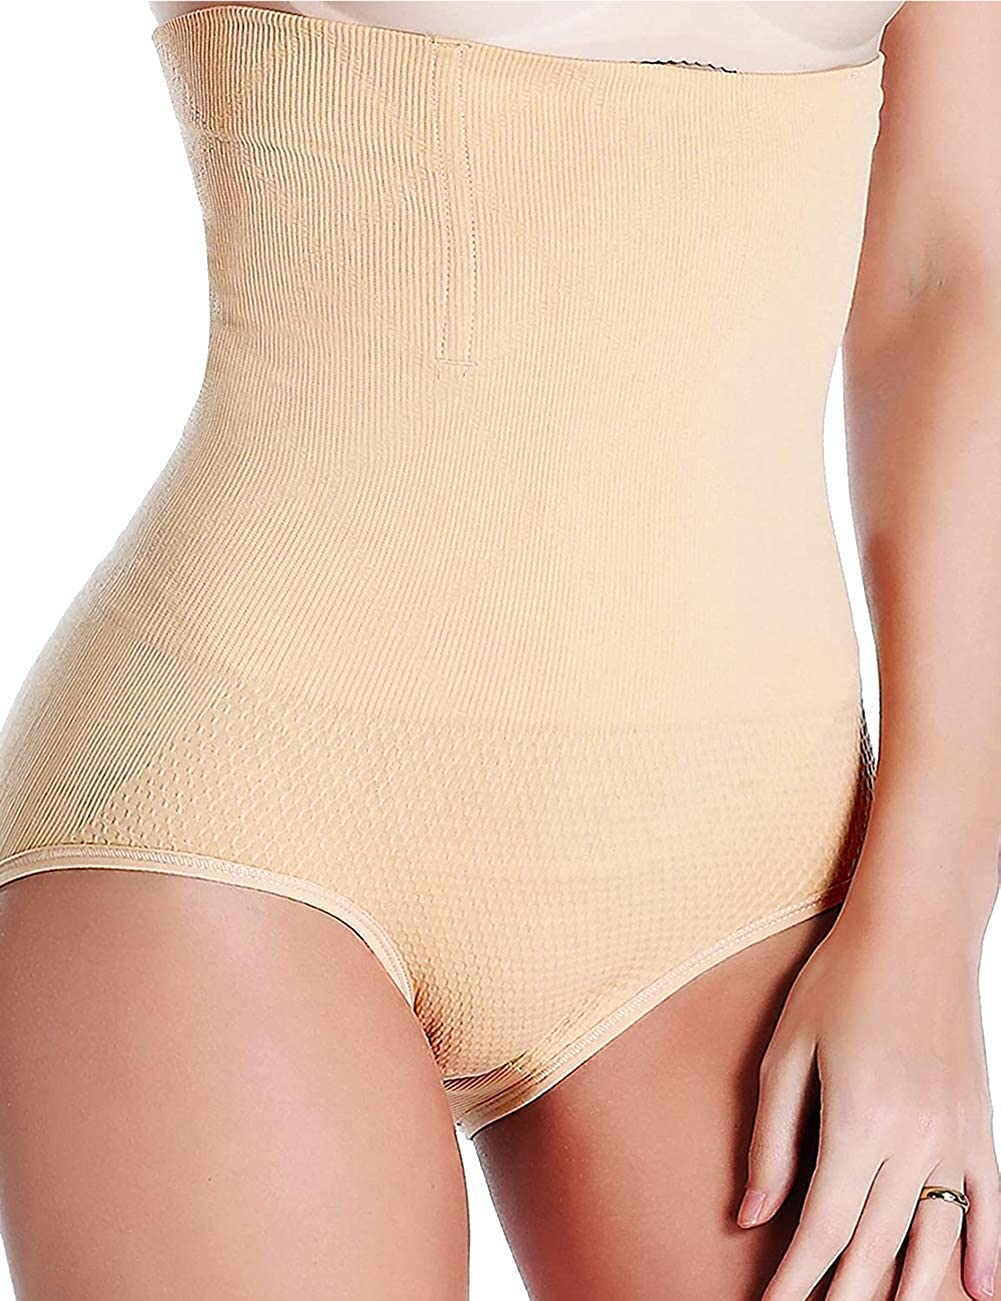 Hopgo Women Waist Trainer Shapewear Tummy Control Body Shaper Shorts Power Pants